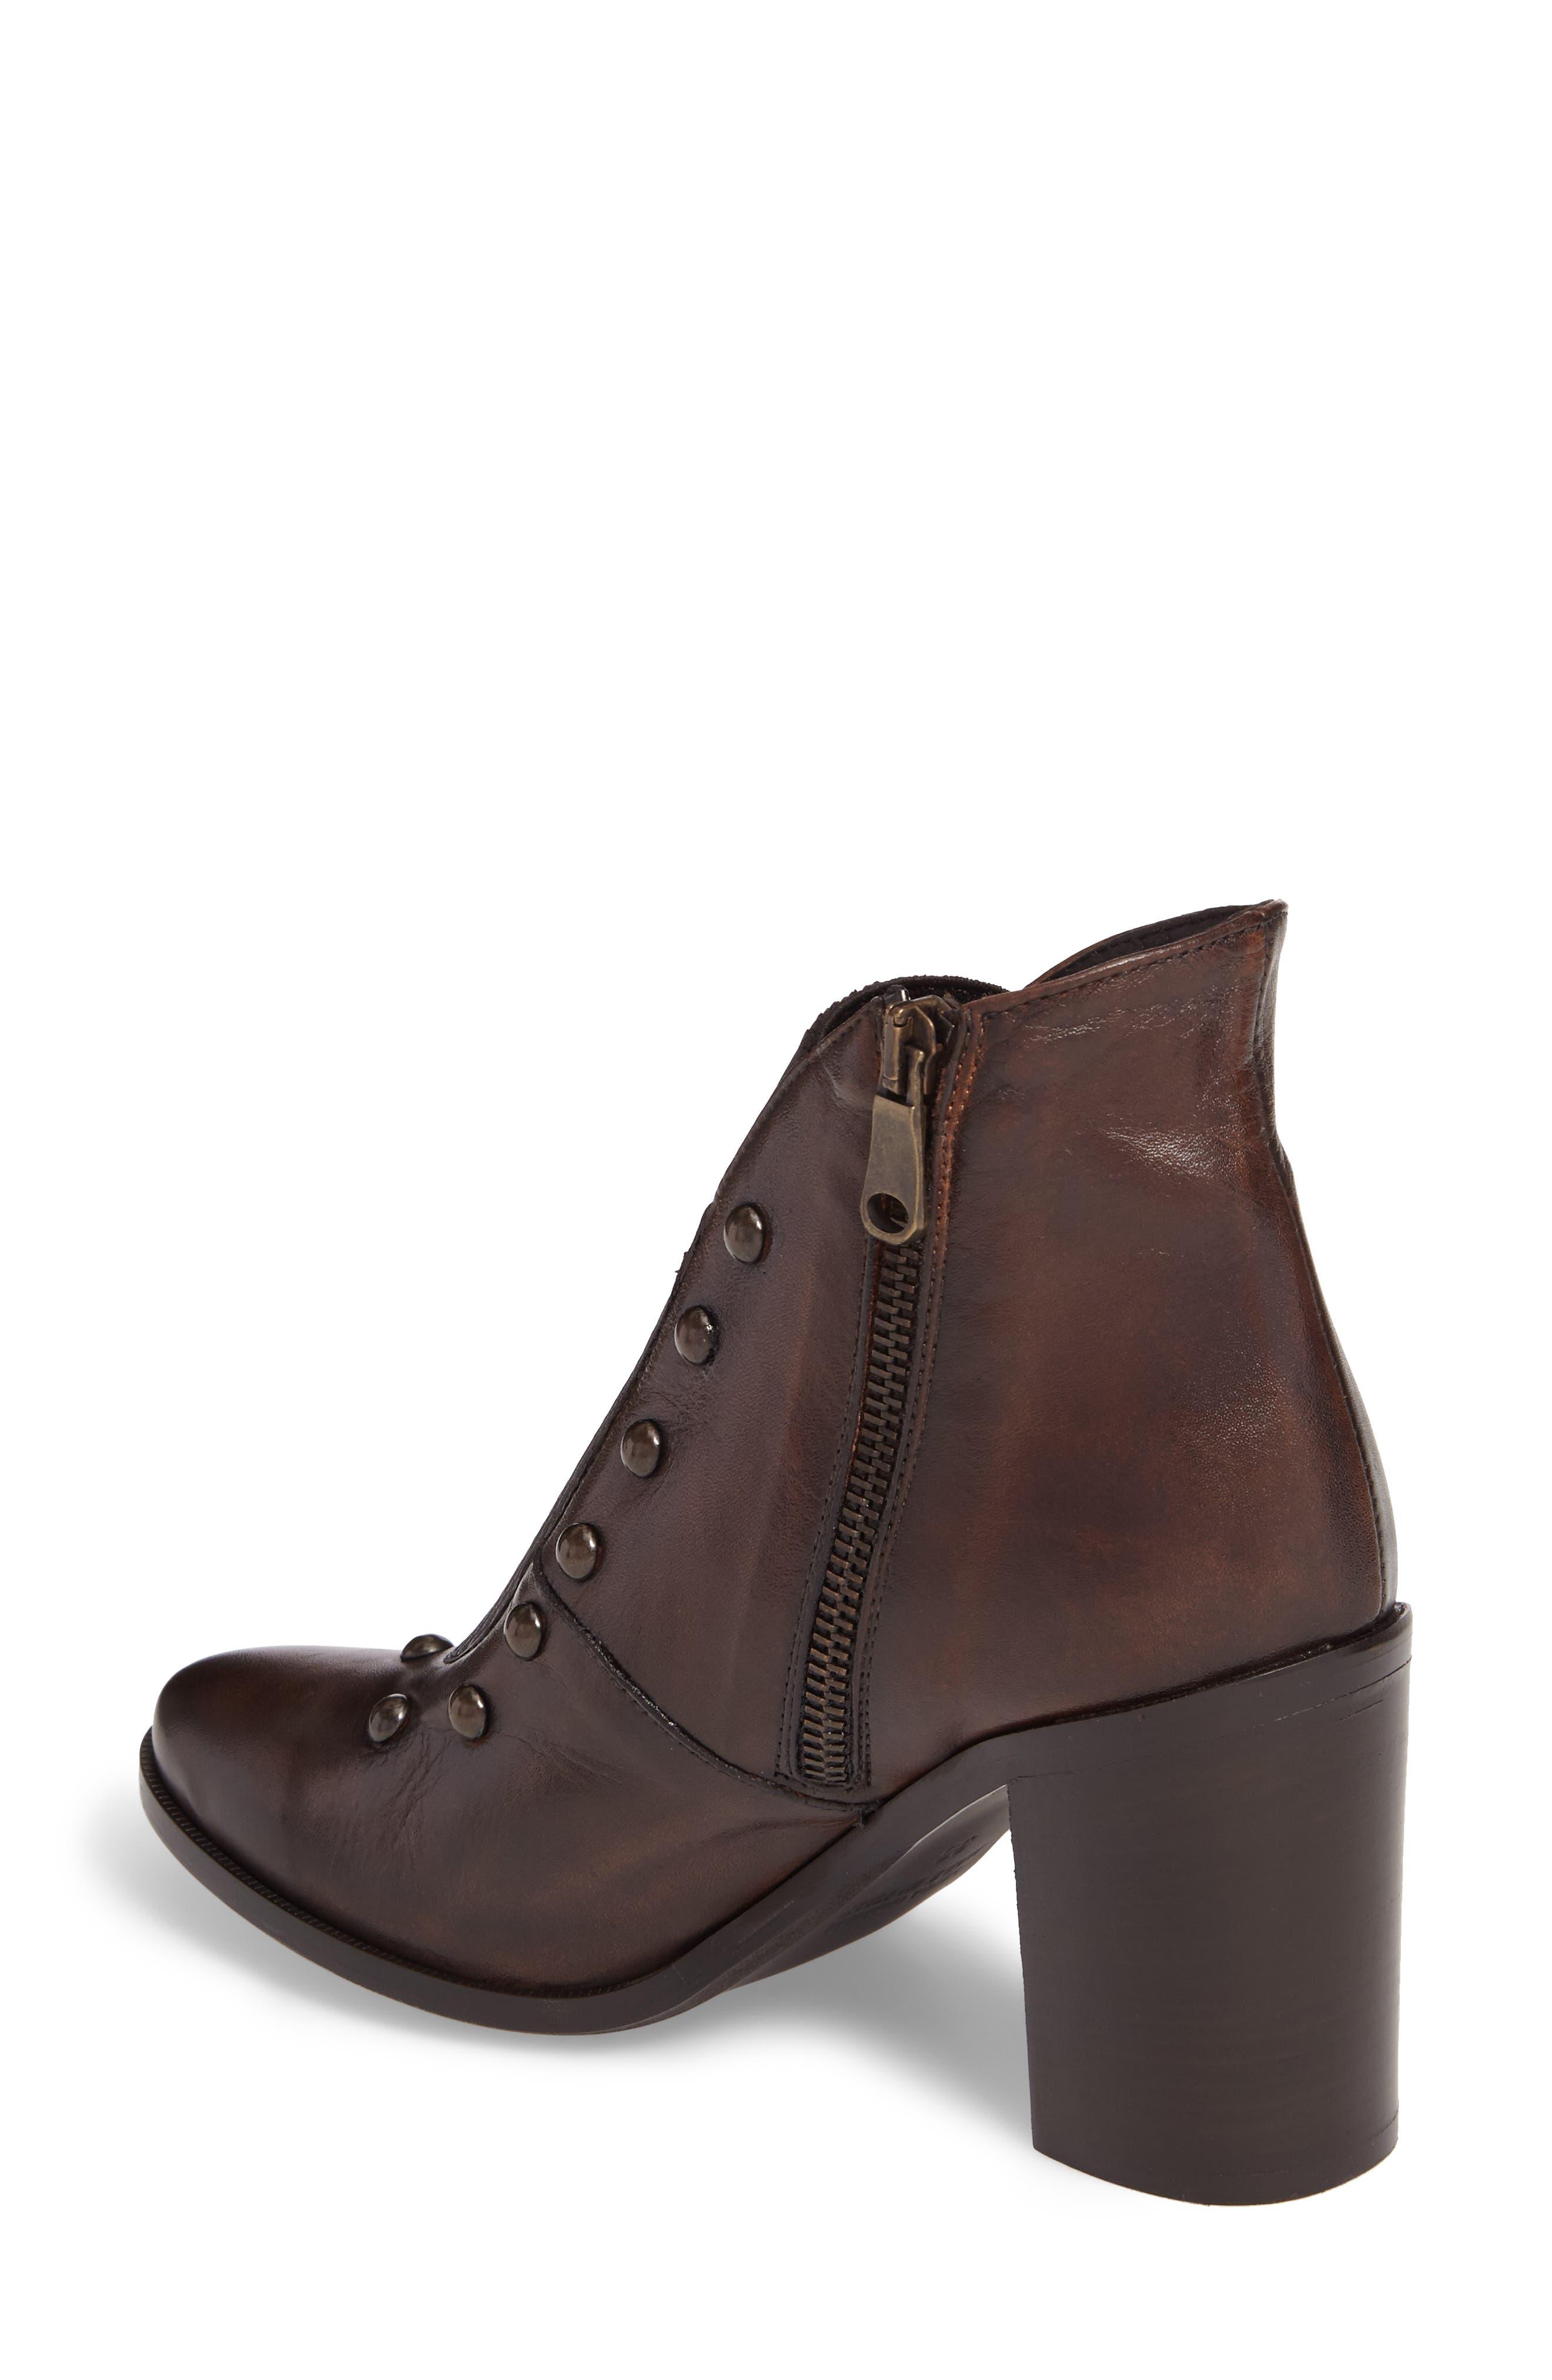 Beatrix Studded Bootie,                             Alternate thumbnail 2, color,                             Deer Leather